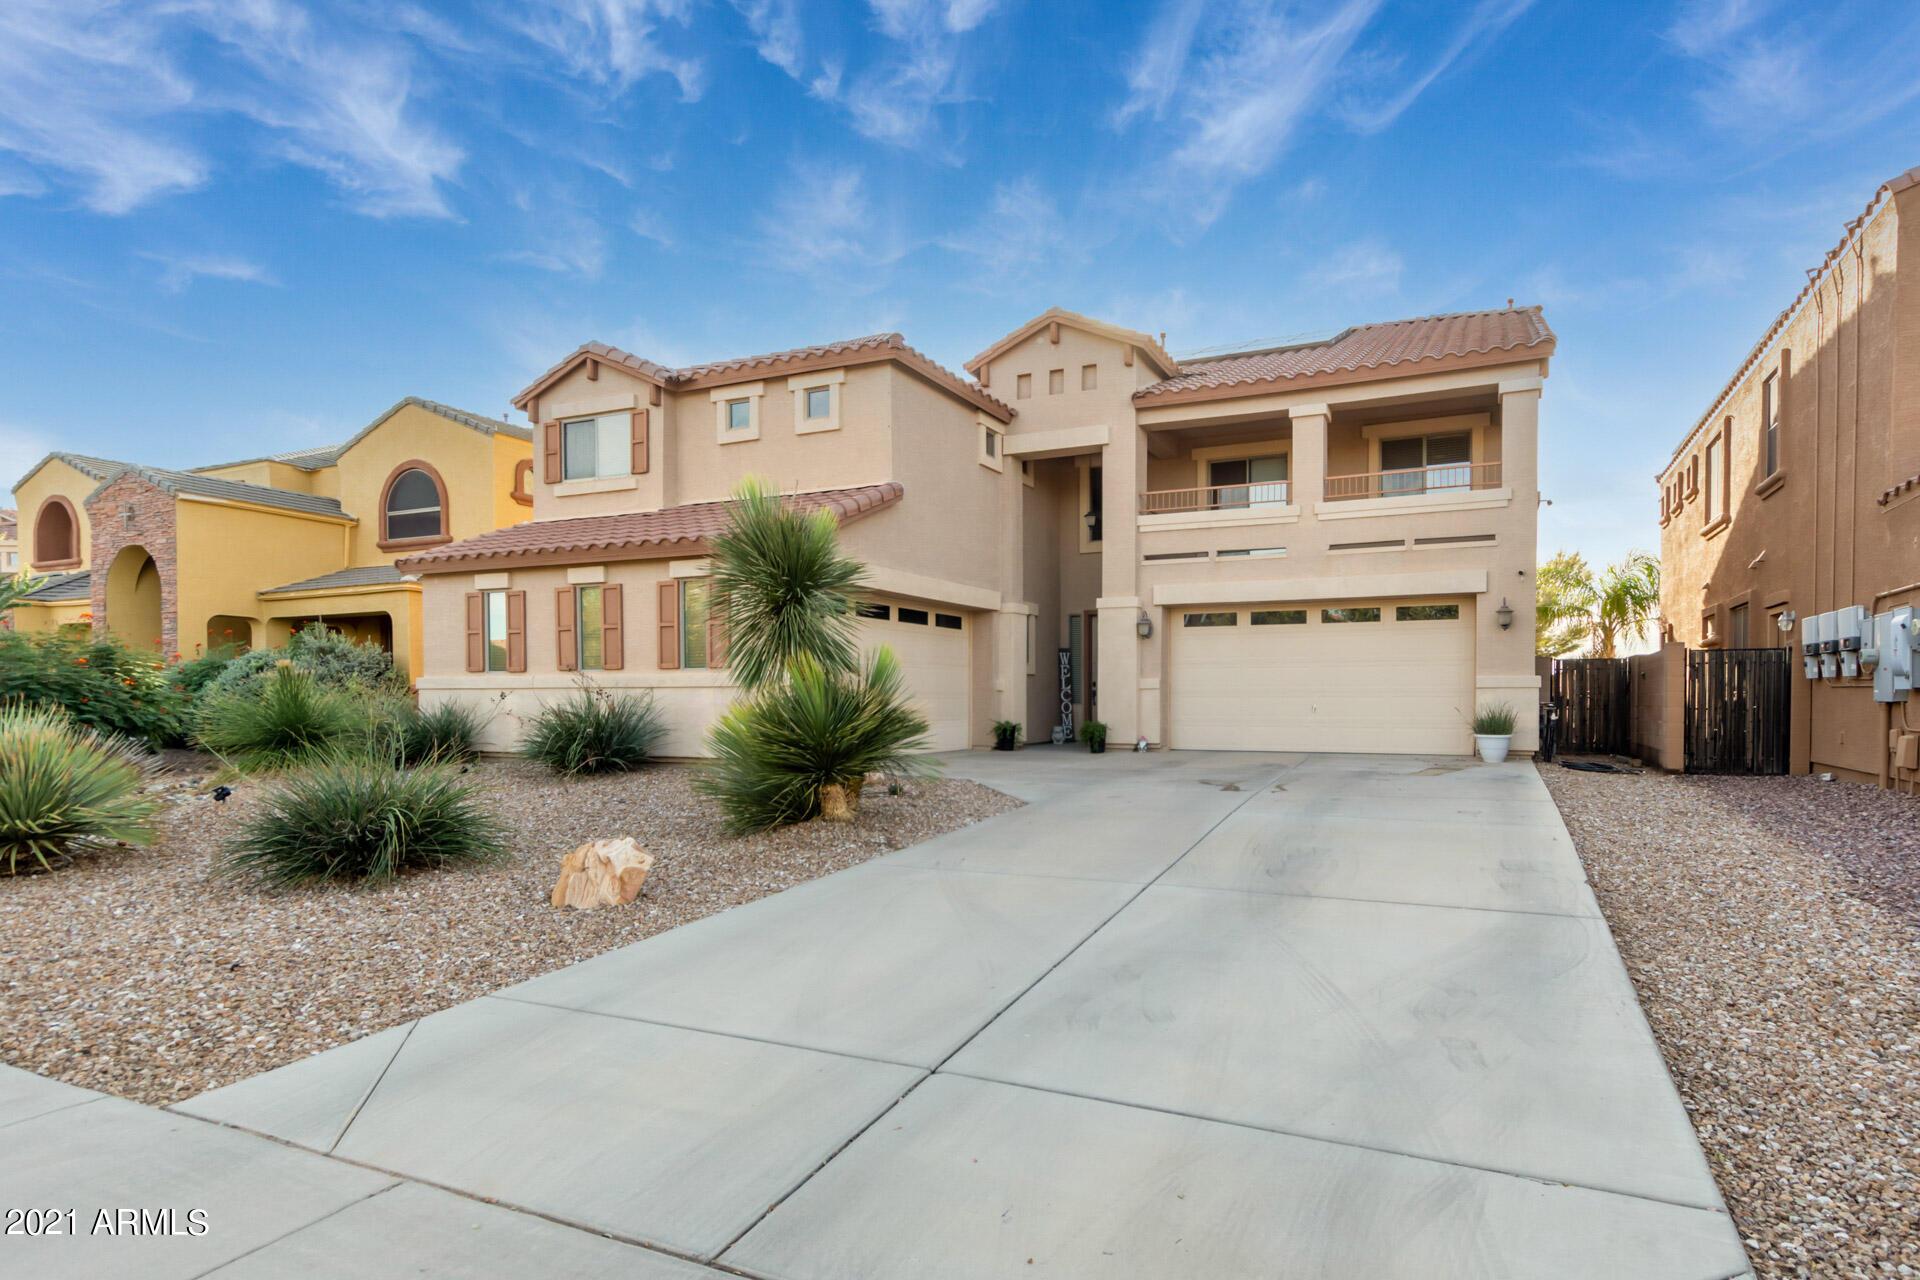 MLS 6303641 25414 N POSEIDON Road, Florence, AZ 85132 Florence AZ Four Bedroom